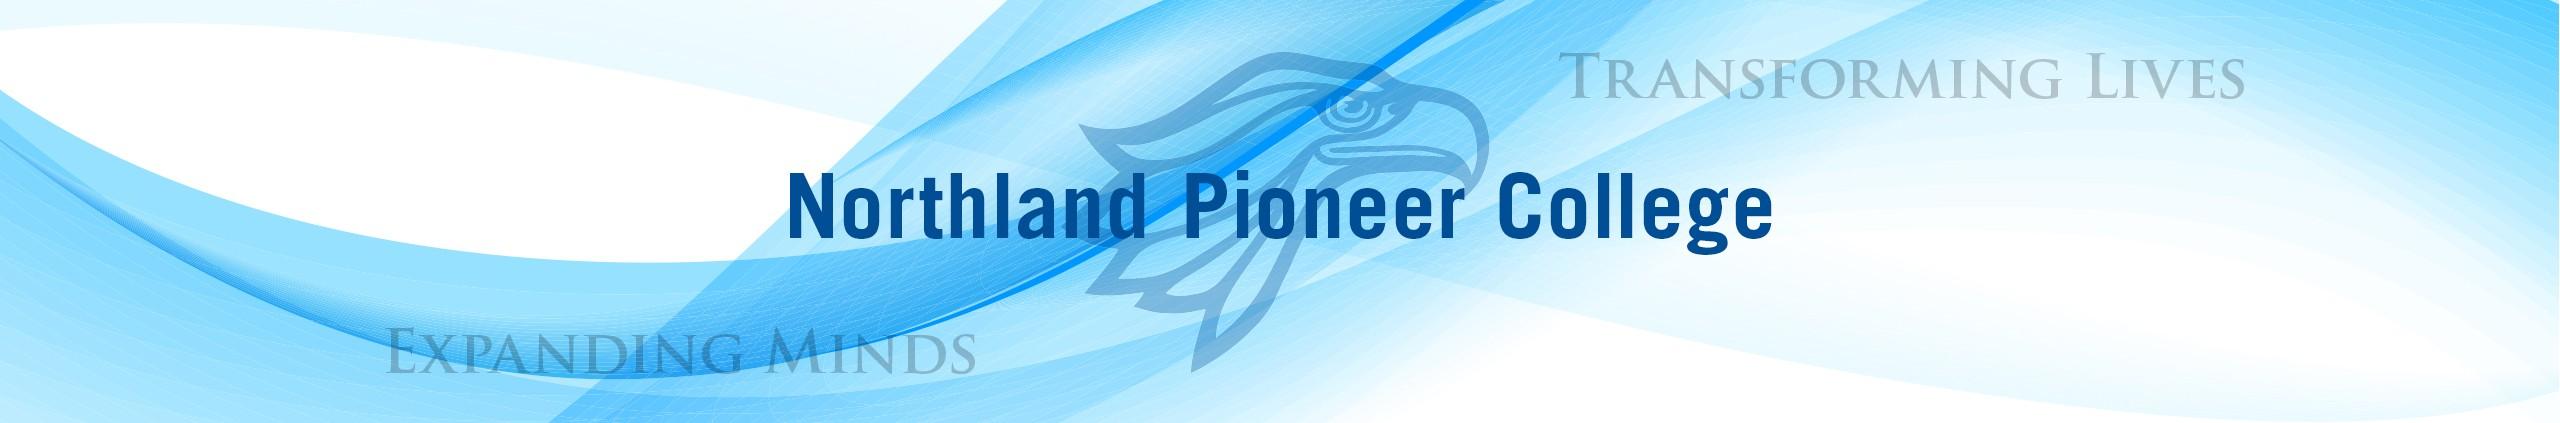 Northland Pioneer College | LinkedIn